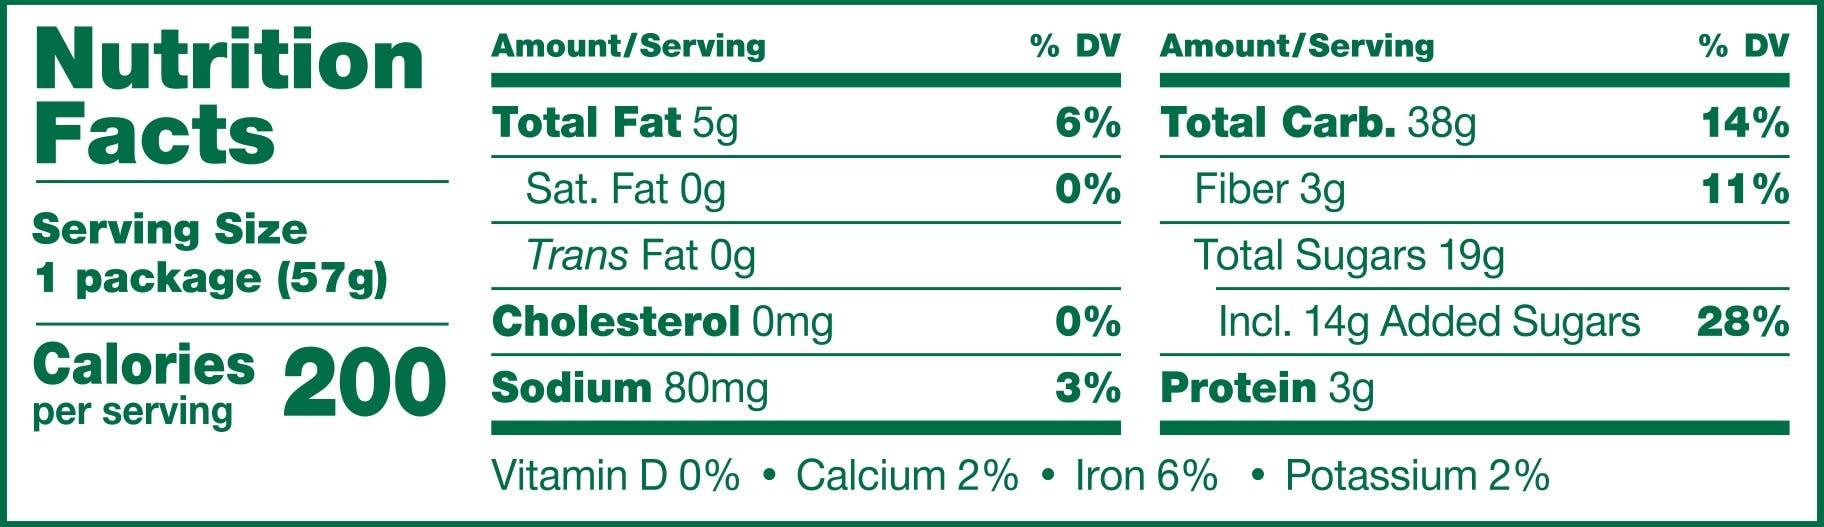 Whole Wheat Apple Cinnamon Nutrition Panel